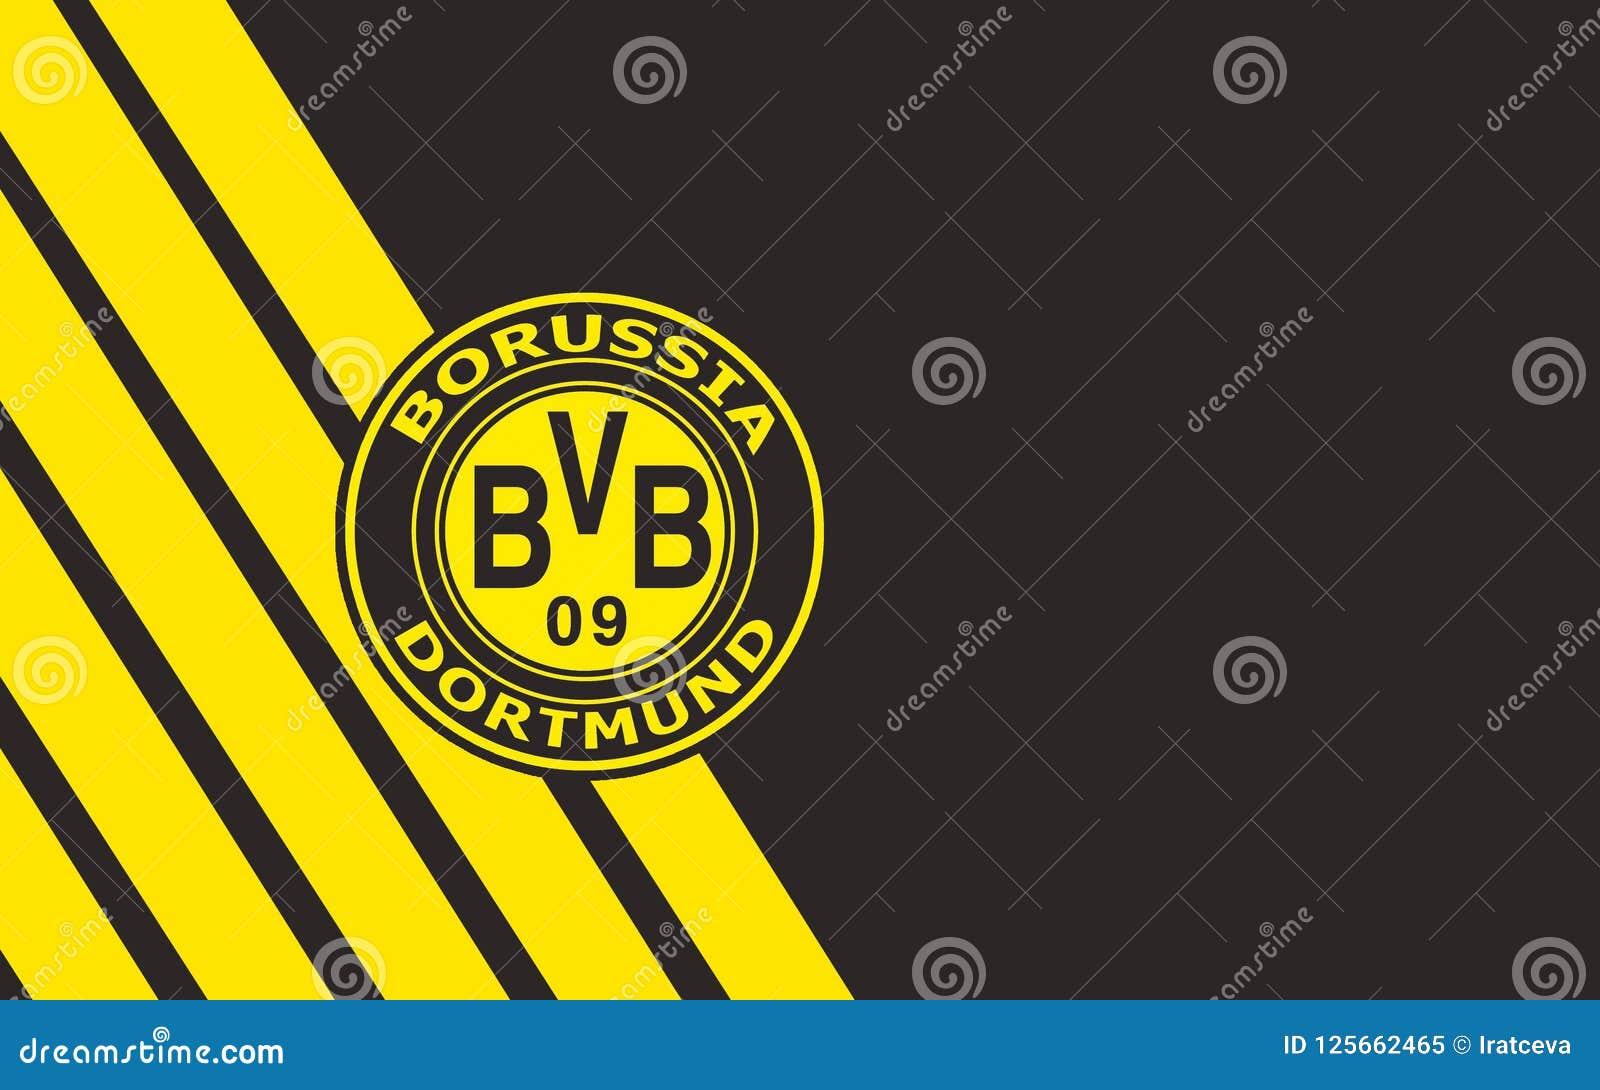 Flag Football Club Borussia Dortmund Gegmany Editorial Image Image Of Banner Fabric 125662465